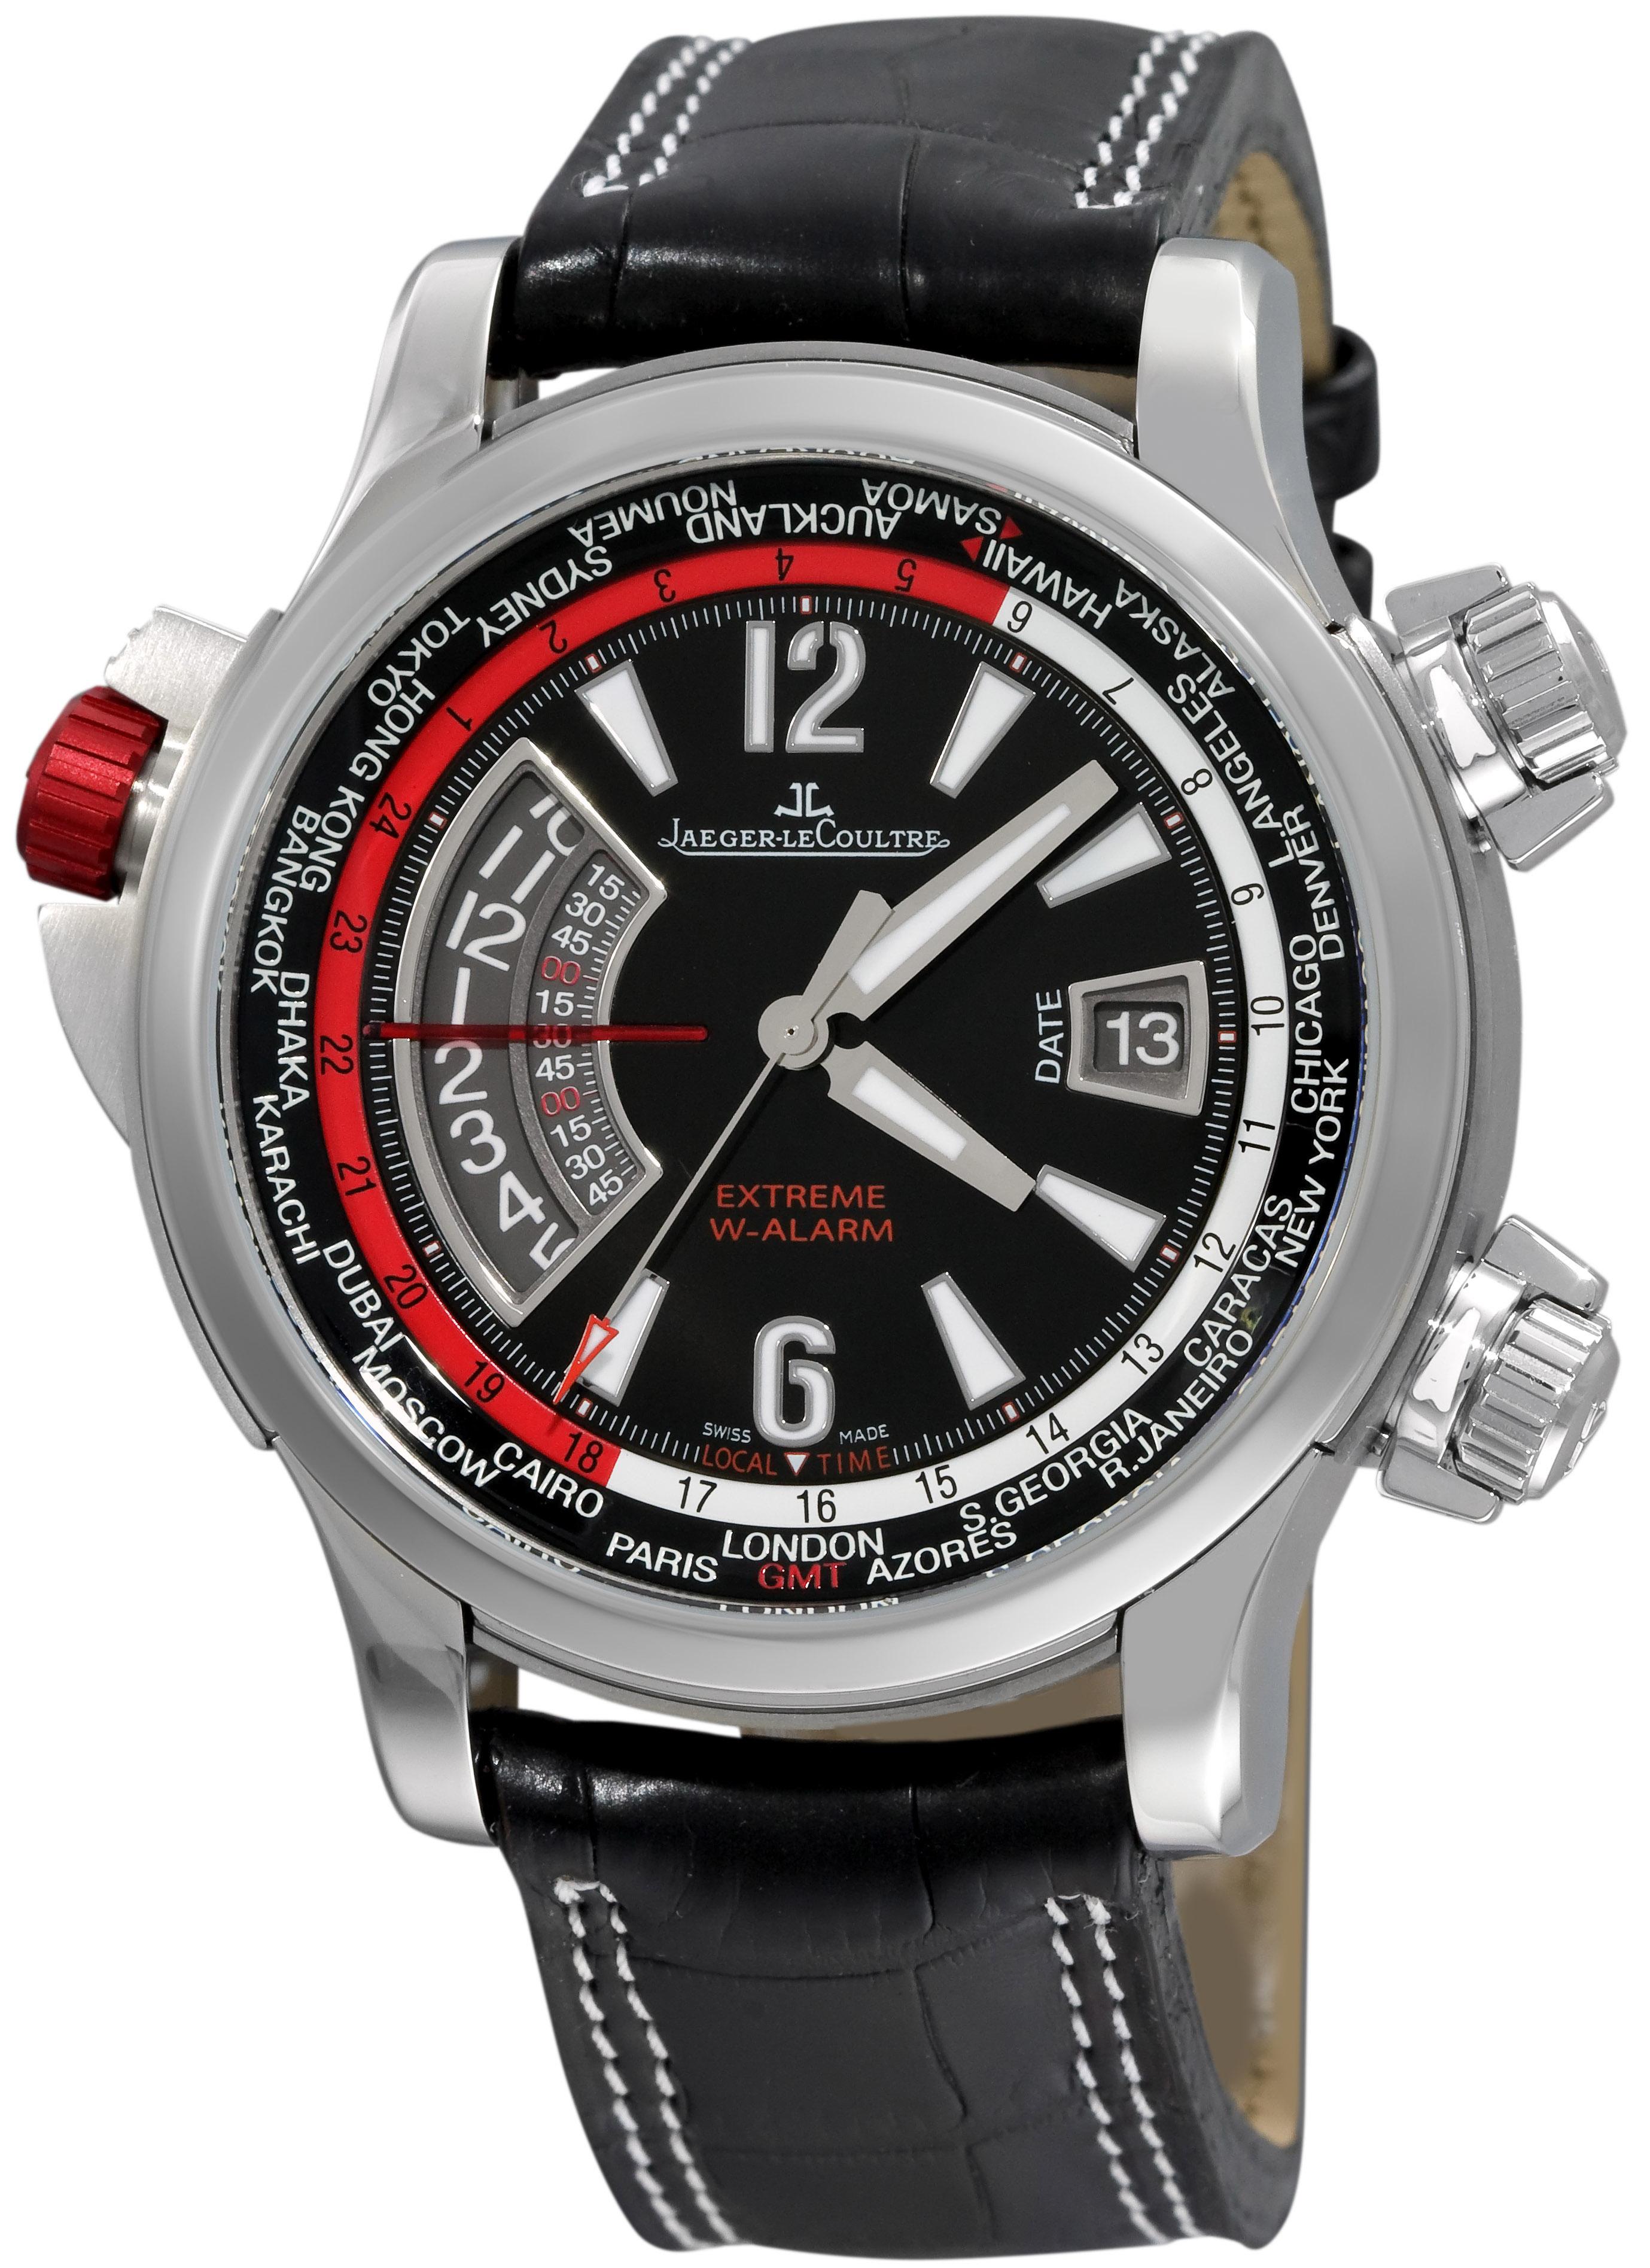 Image of Jaeger-LeCoultre Master Compressor W-Alarm Mens Watch Model Q1778470